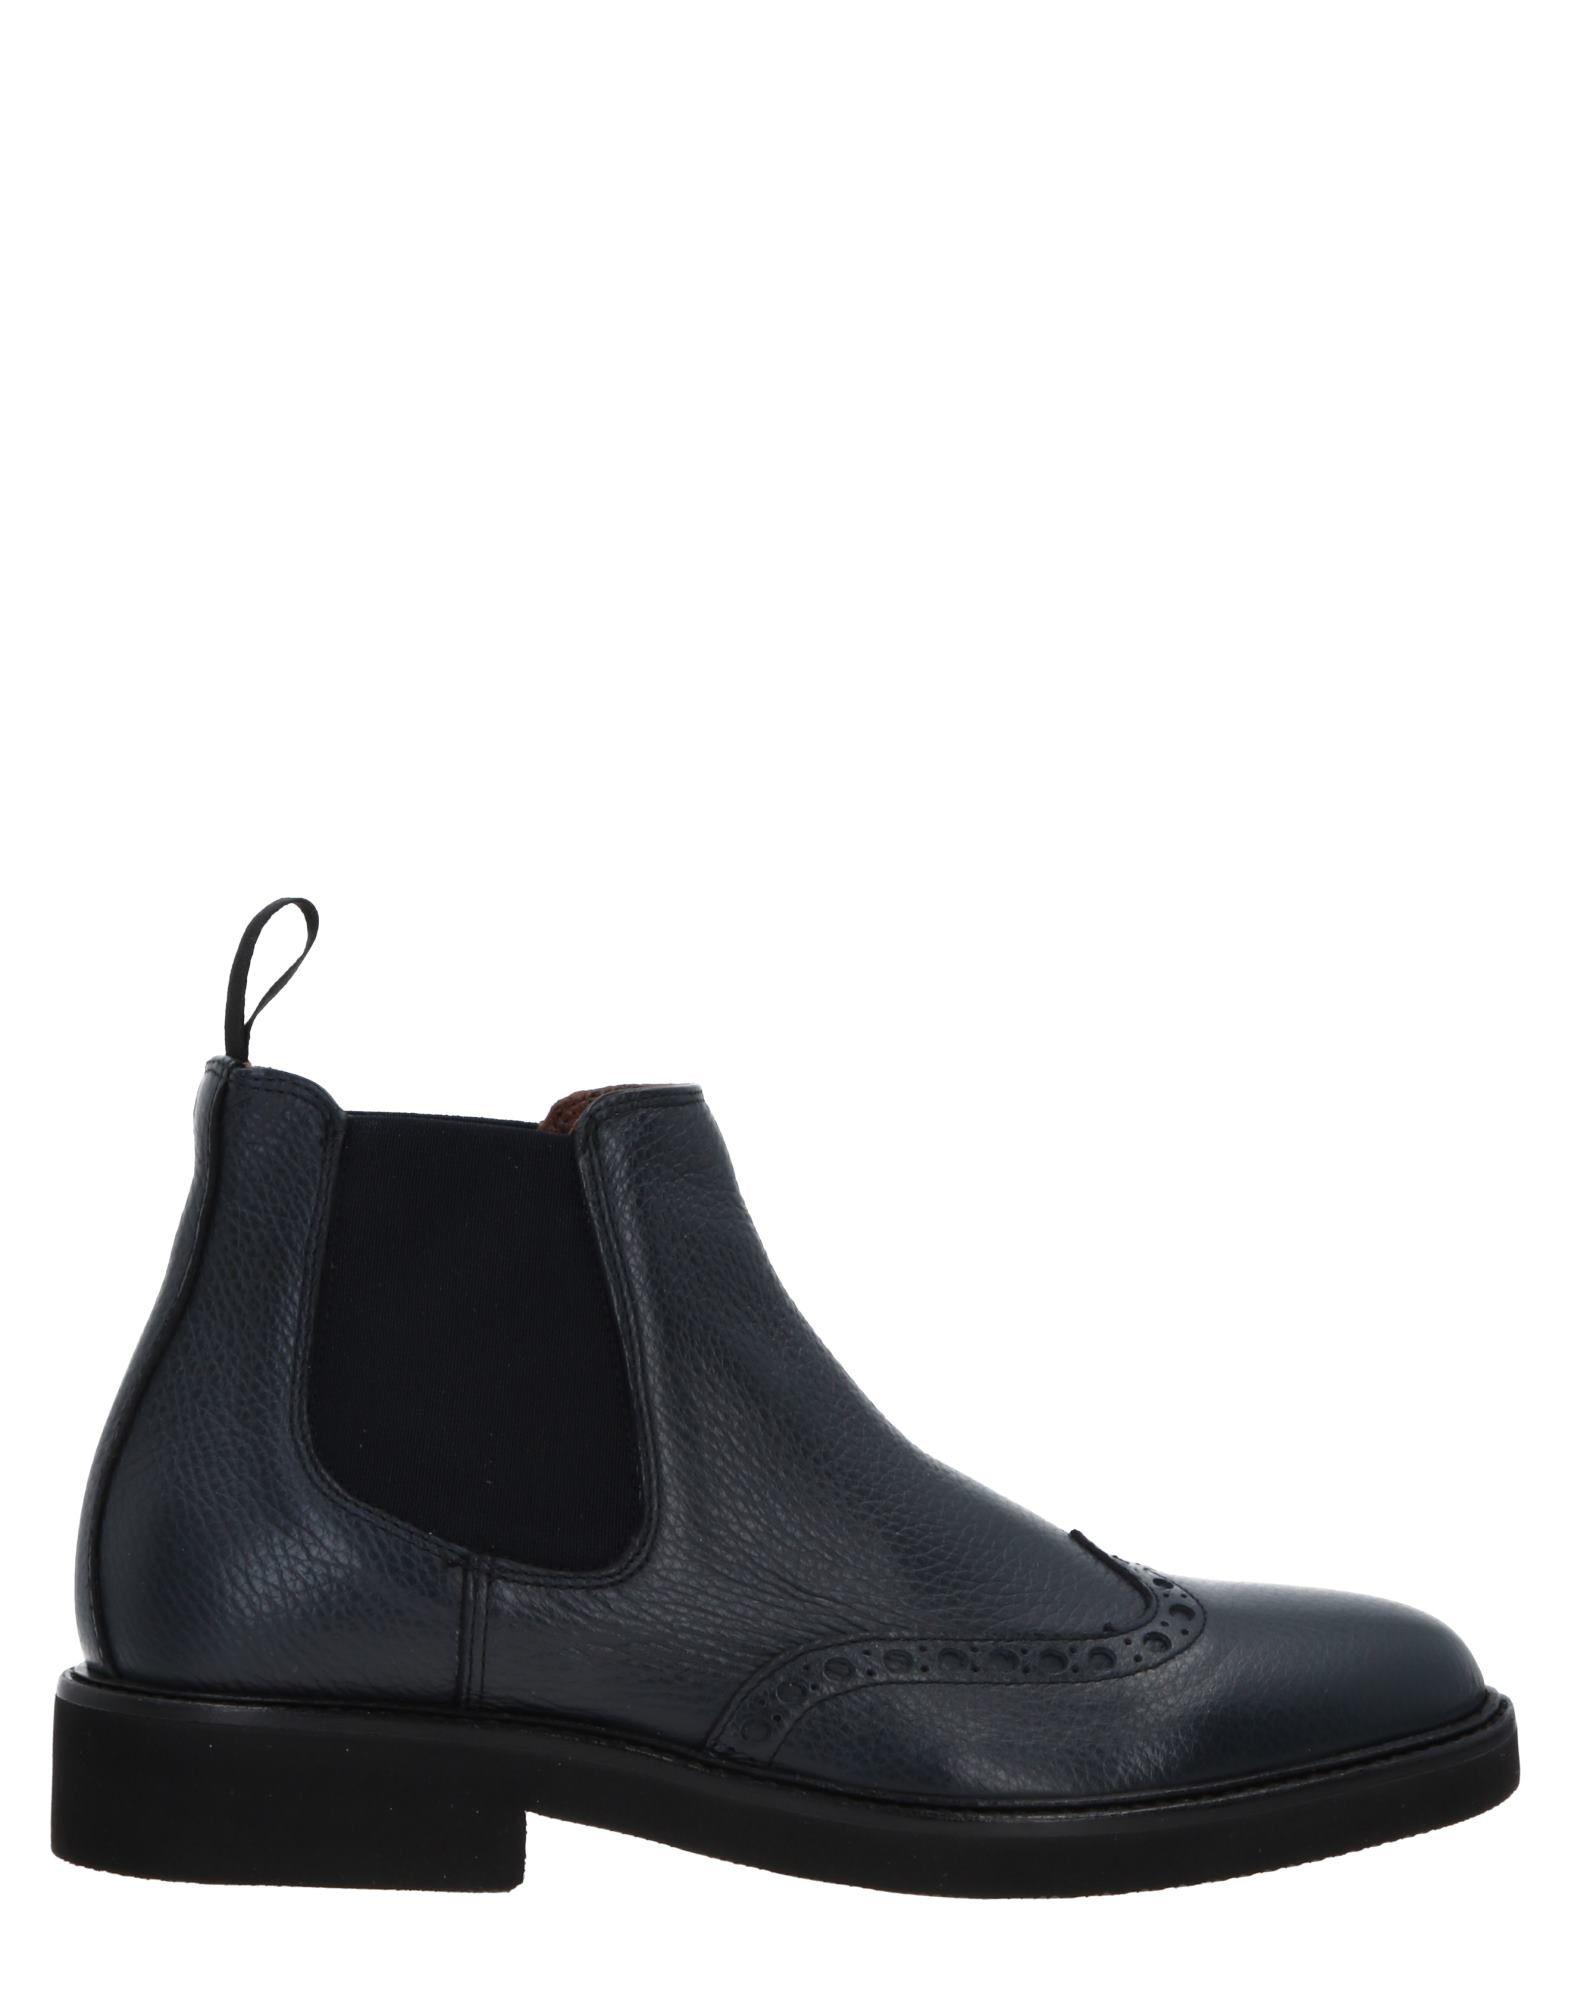 ROBERTO BOTTICELLI Boots in Dark Blue